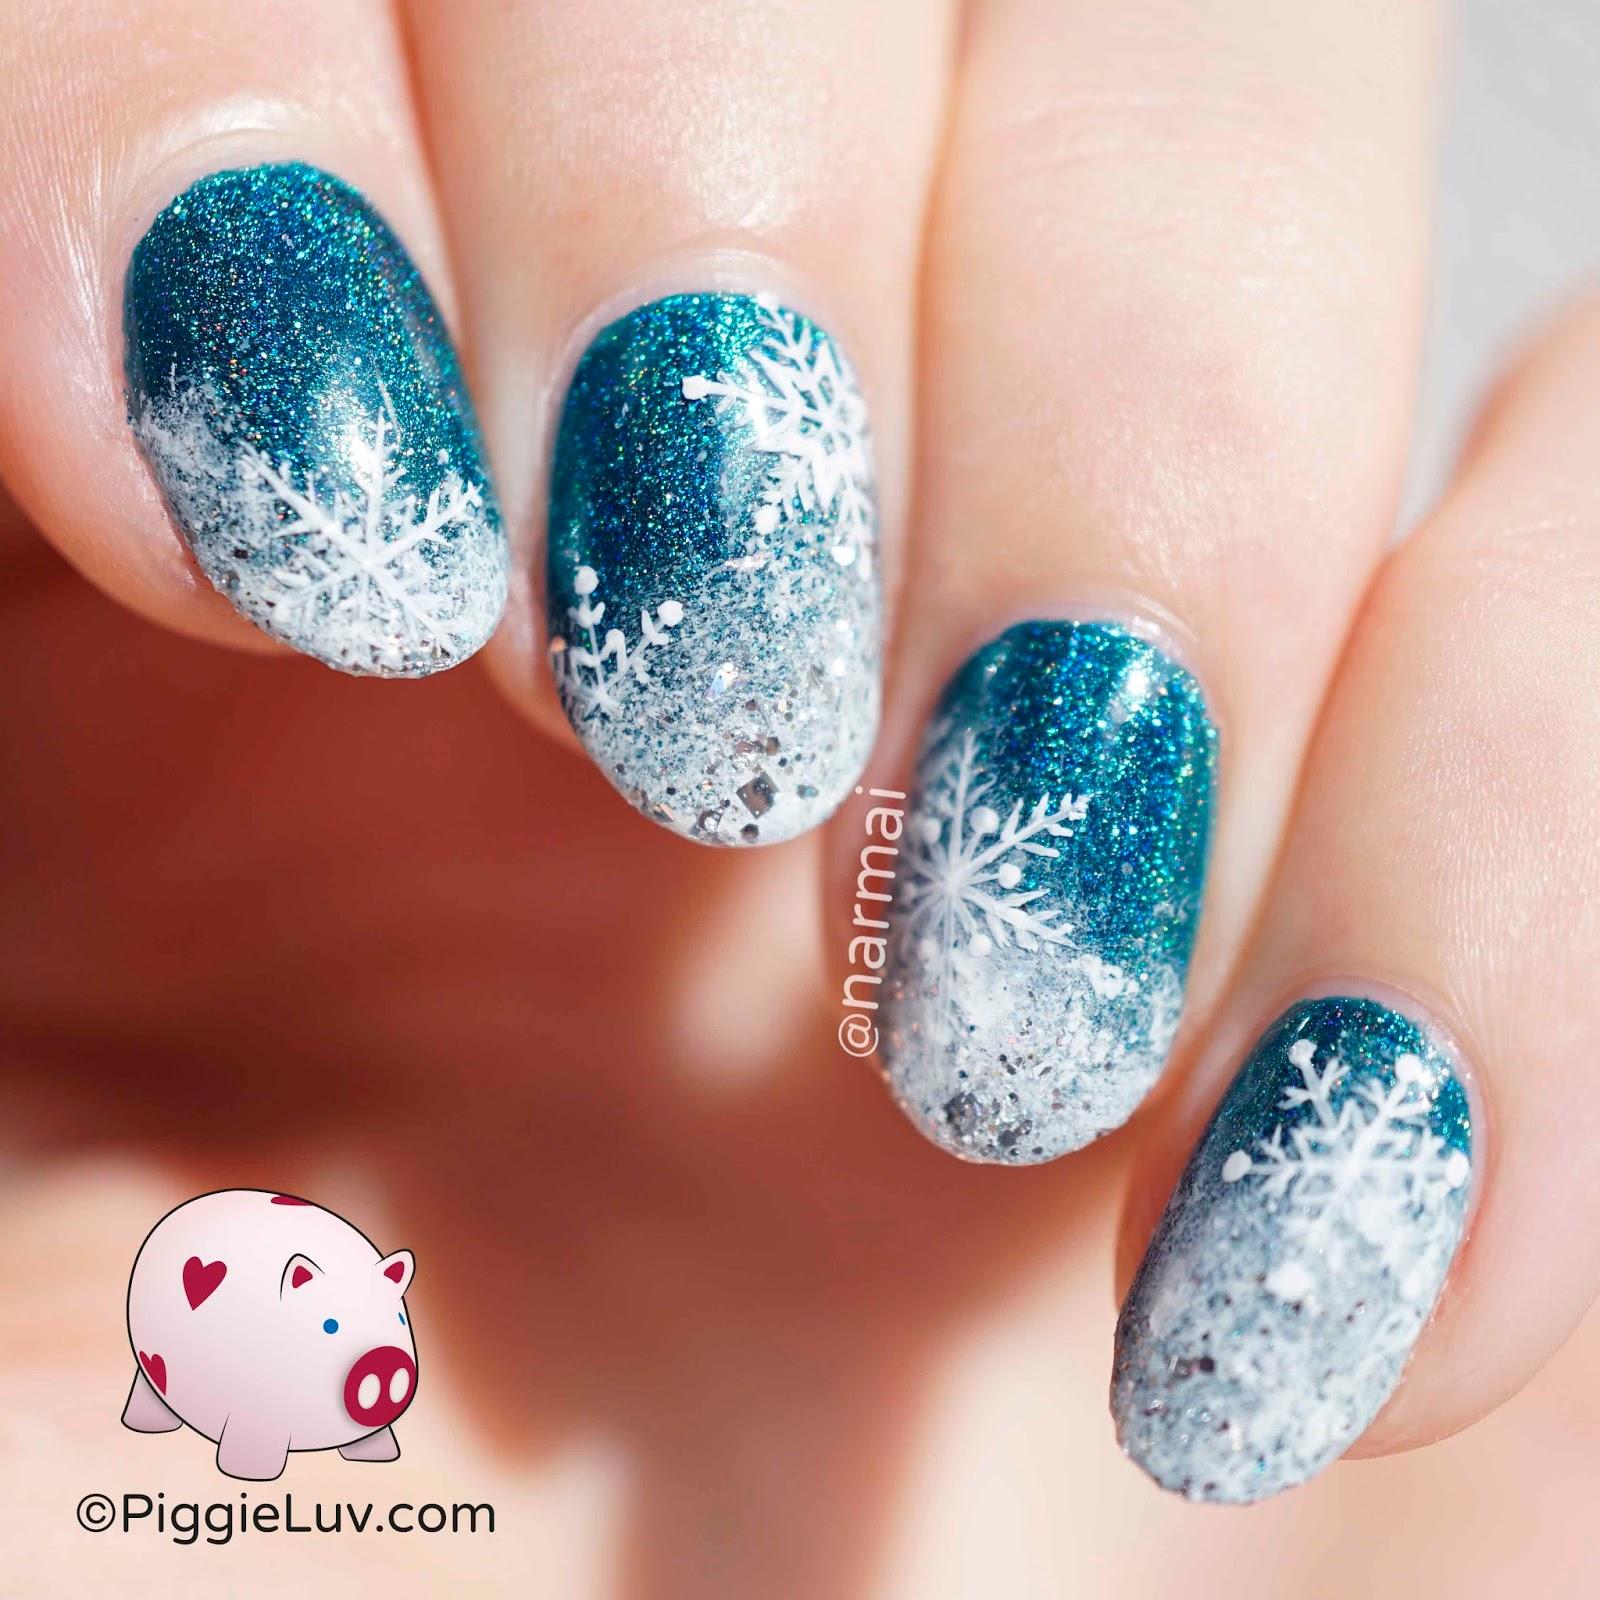 Snowflake Nail Art Tutorial: PiggieLuv: Flakage! Snow Nail Art Tutorial